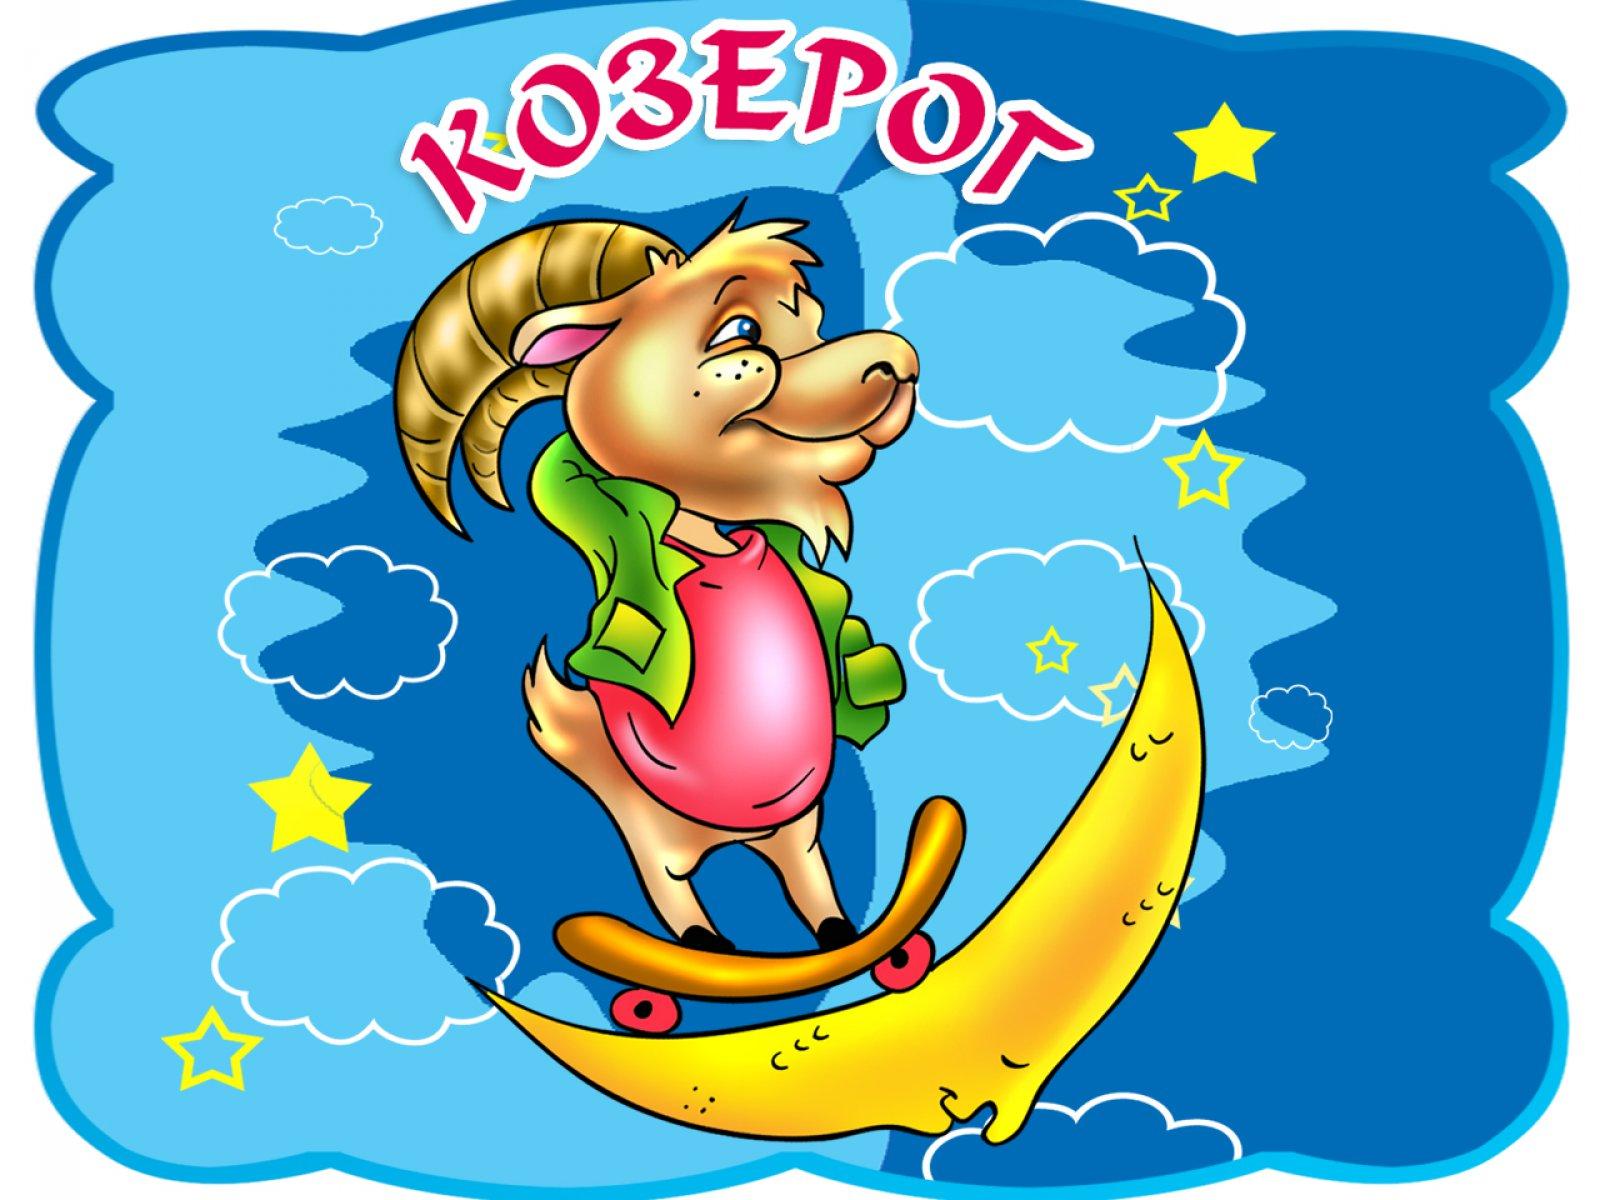 любовный гороскоп нa 2008 год: